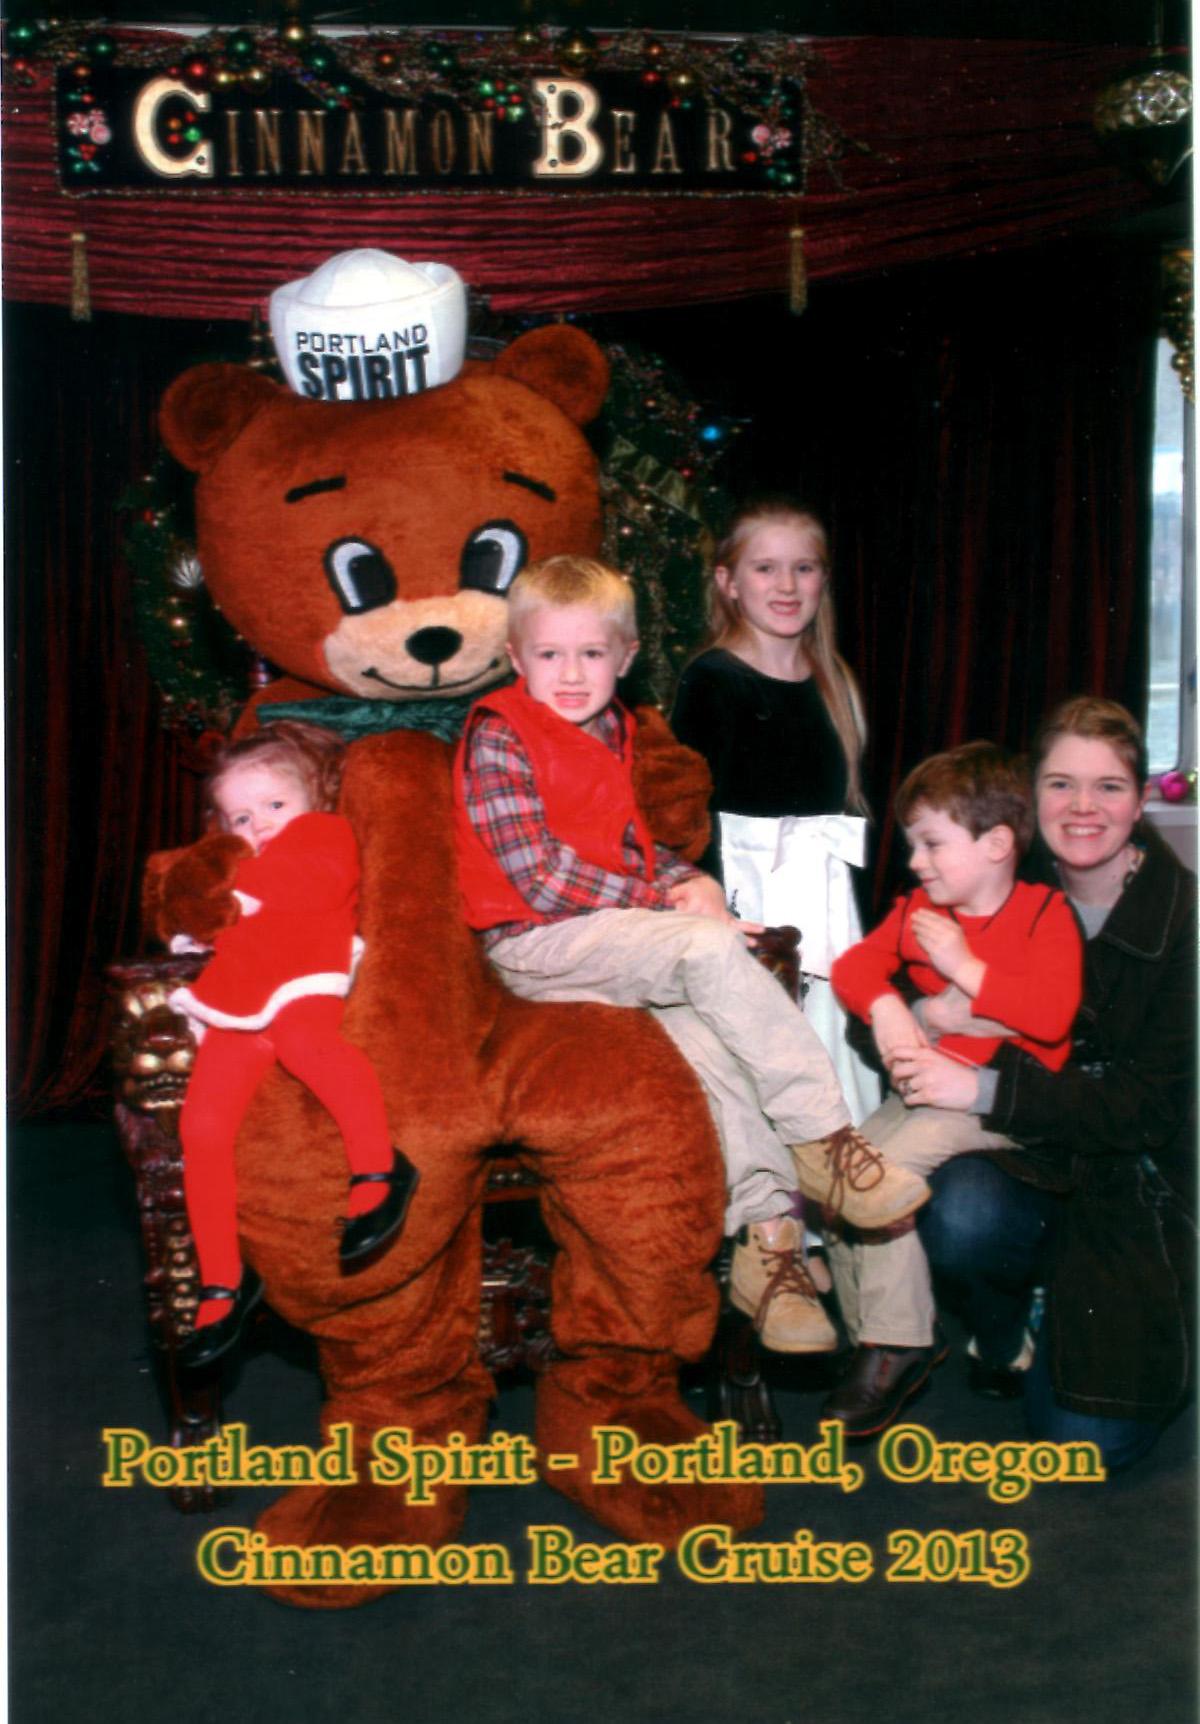 The Cinnamon Bear Cruise On The Portland Spirit